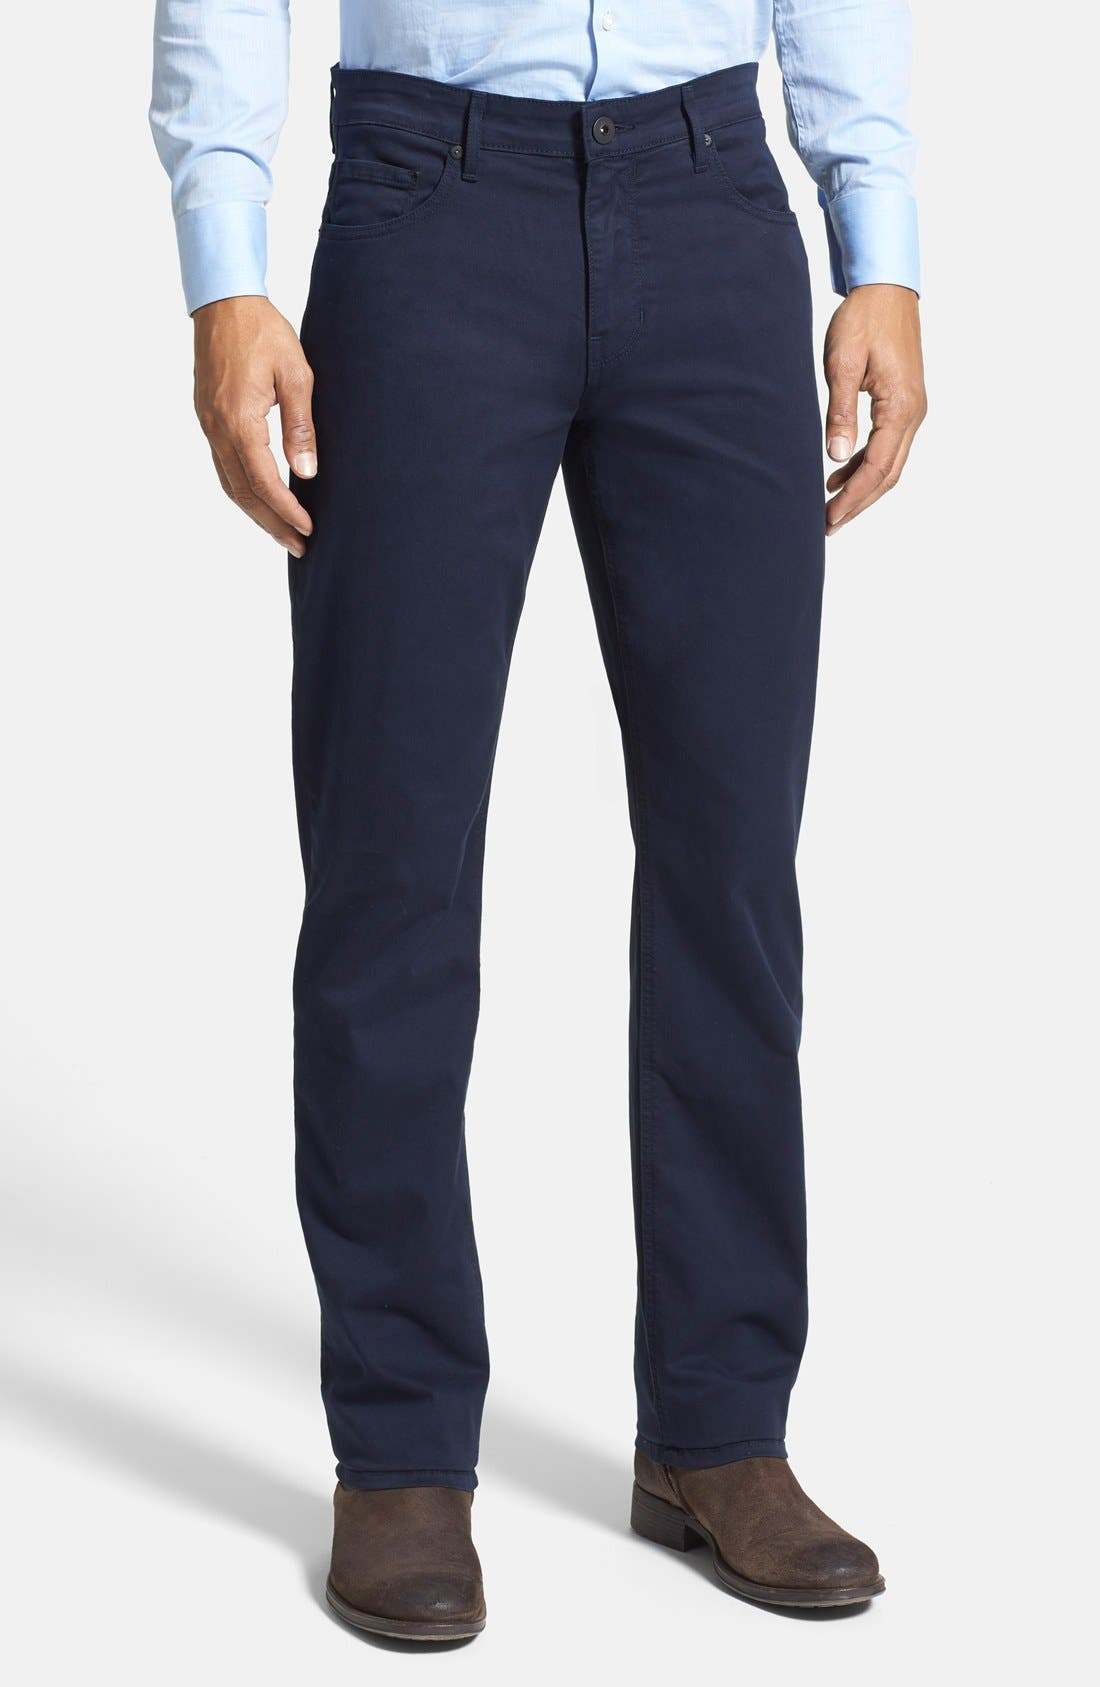 PAIGE Normandie Slim Straight Leg Twill Pants, Main, color, NAVY CADET